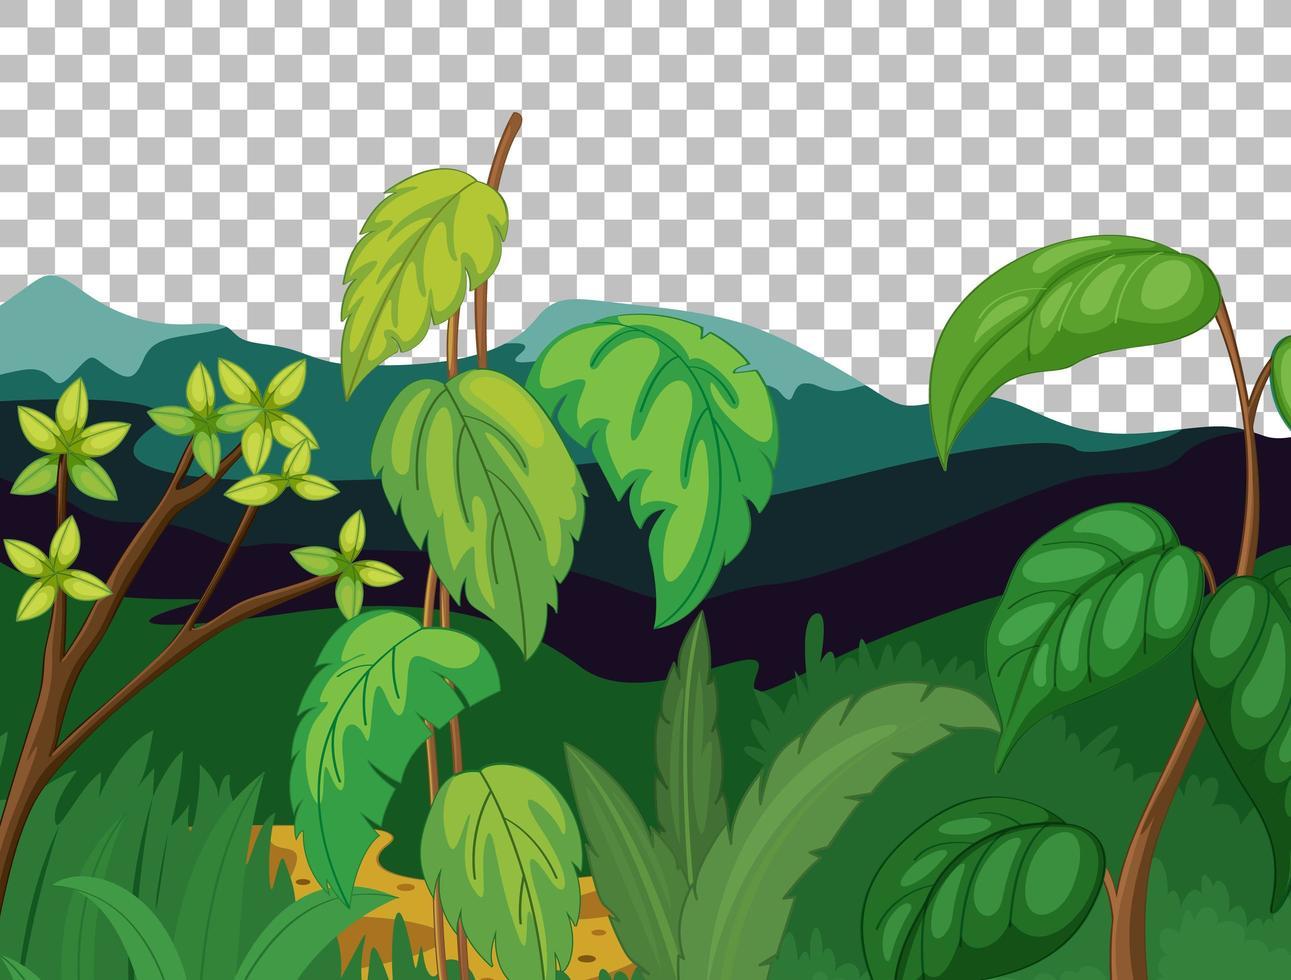 naturaleza paisaje al aire libre fondo transparente vector